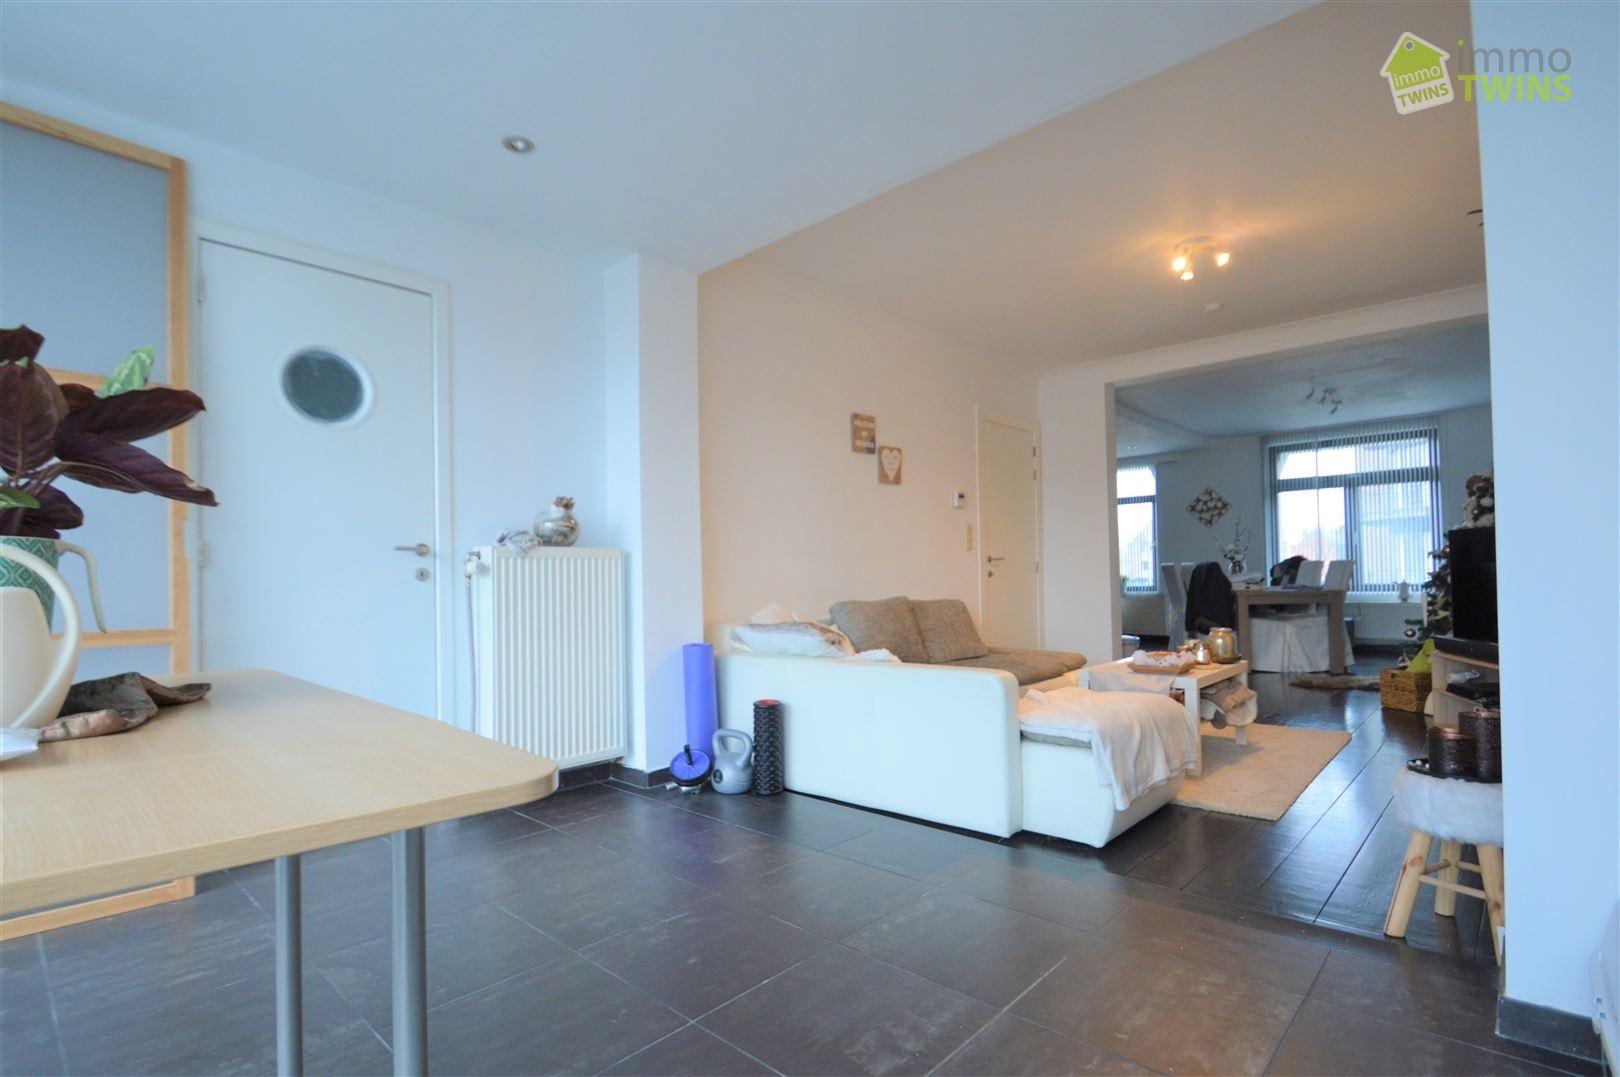 Foto 3 : Duplex/triplex te 9200 DENDERMONDE (België) - Prijs € 650